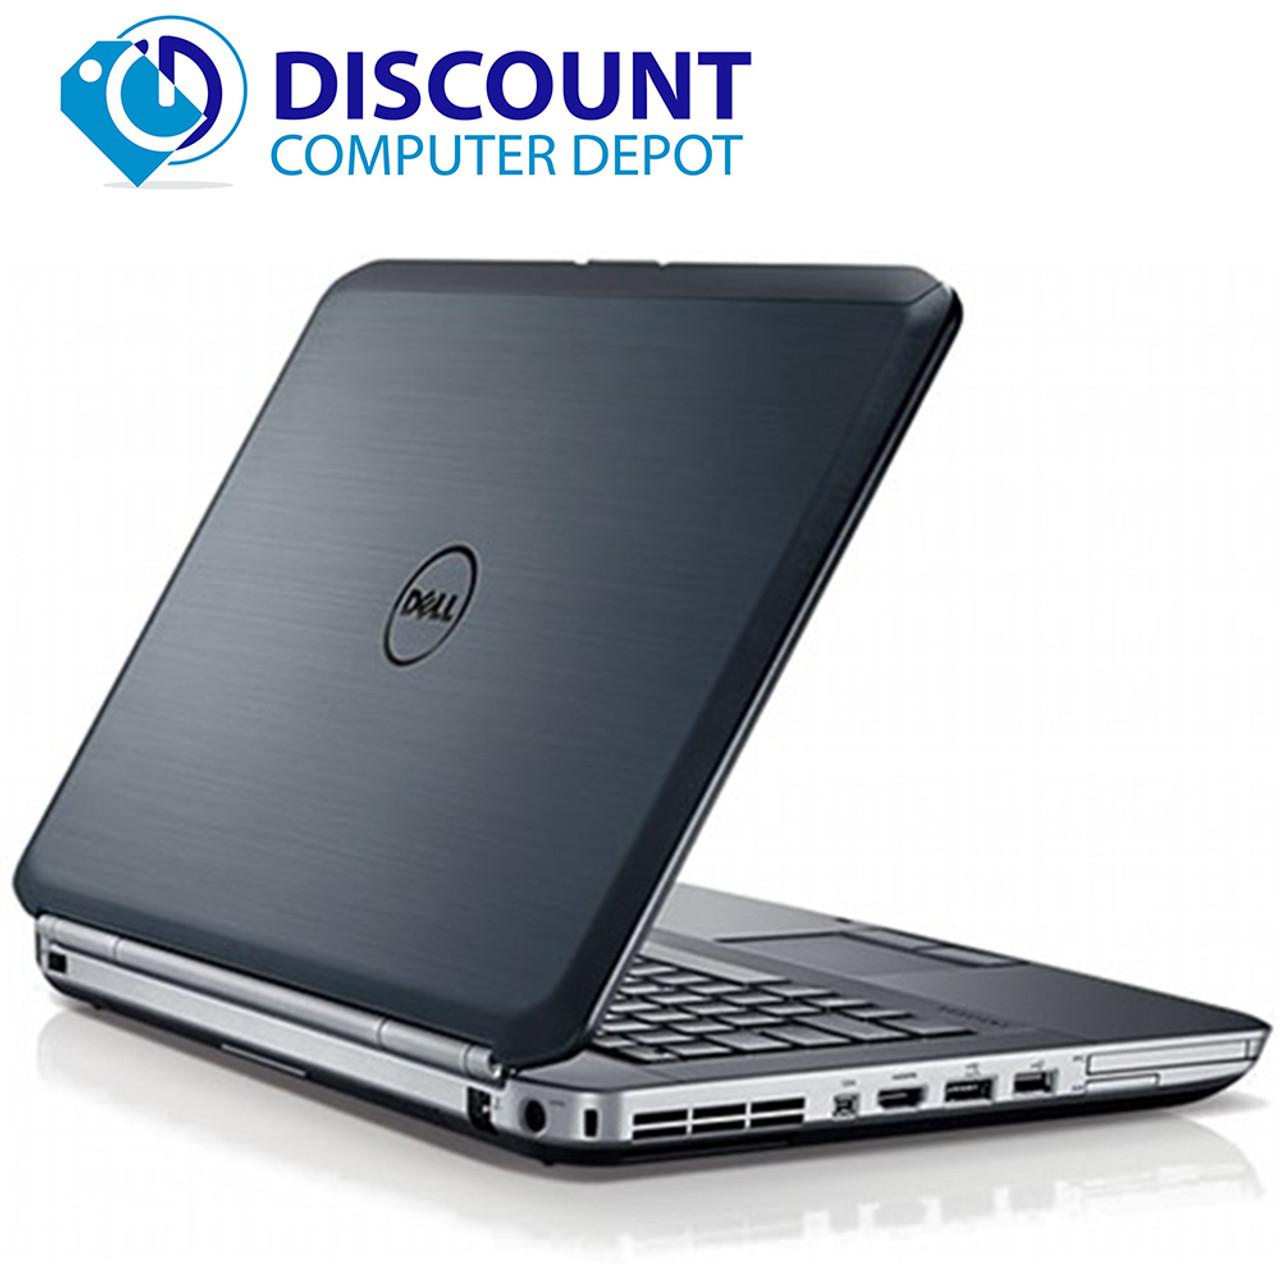 Dell Laptop Latitude E Series Windows 10 i5-2nd Gen 4GB RAM DVD WIFI  Computer